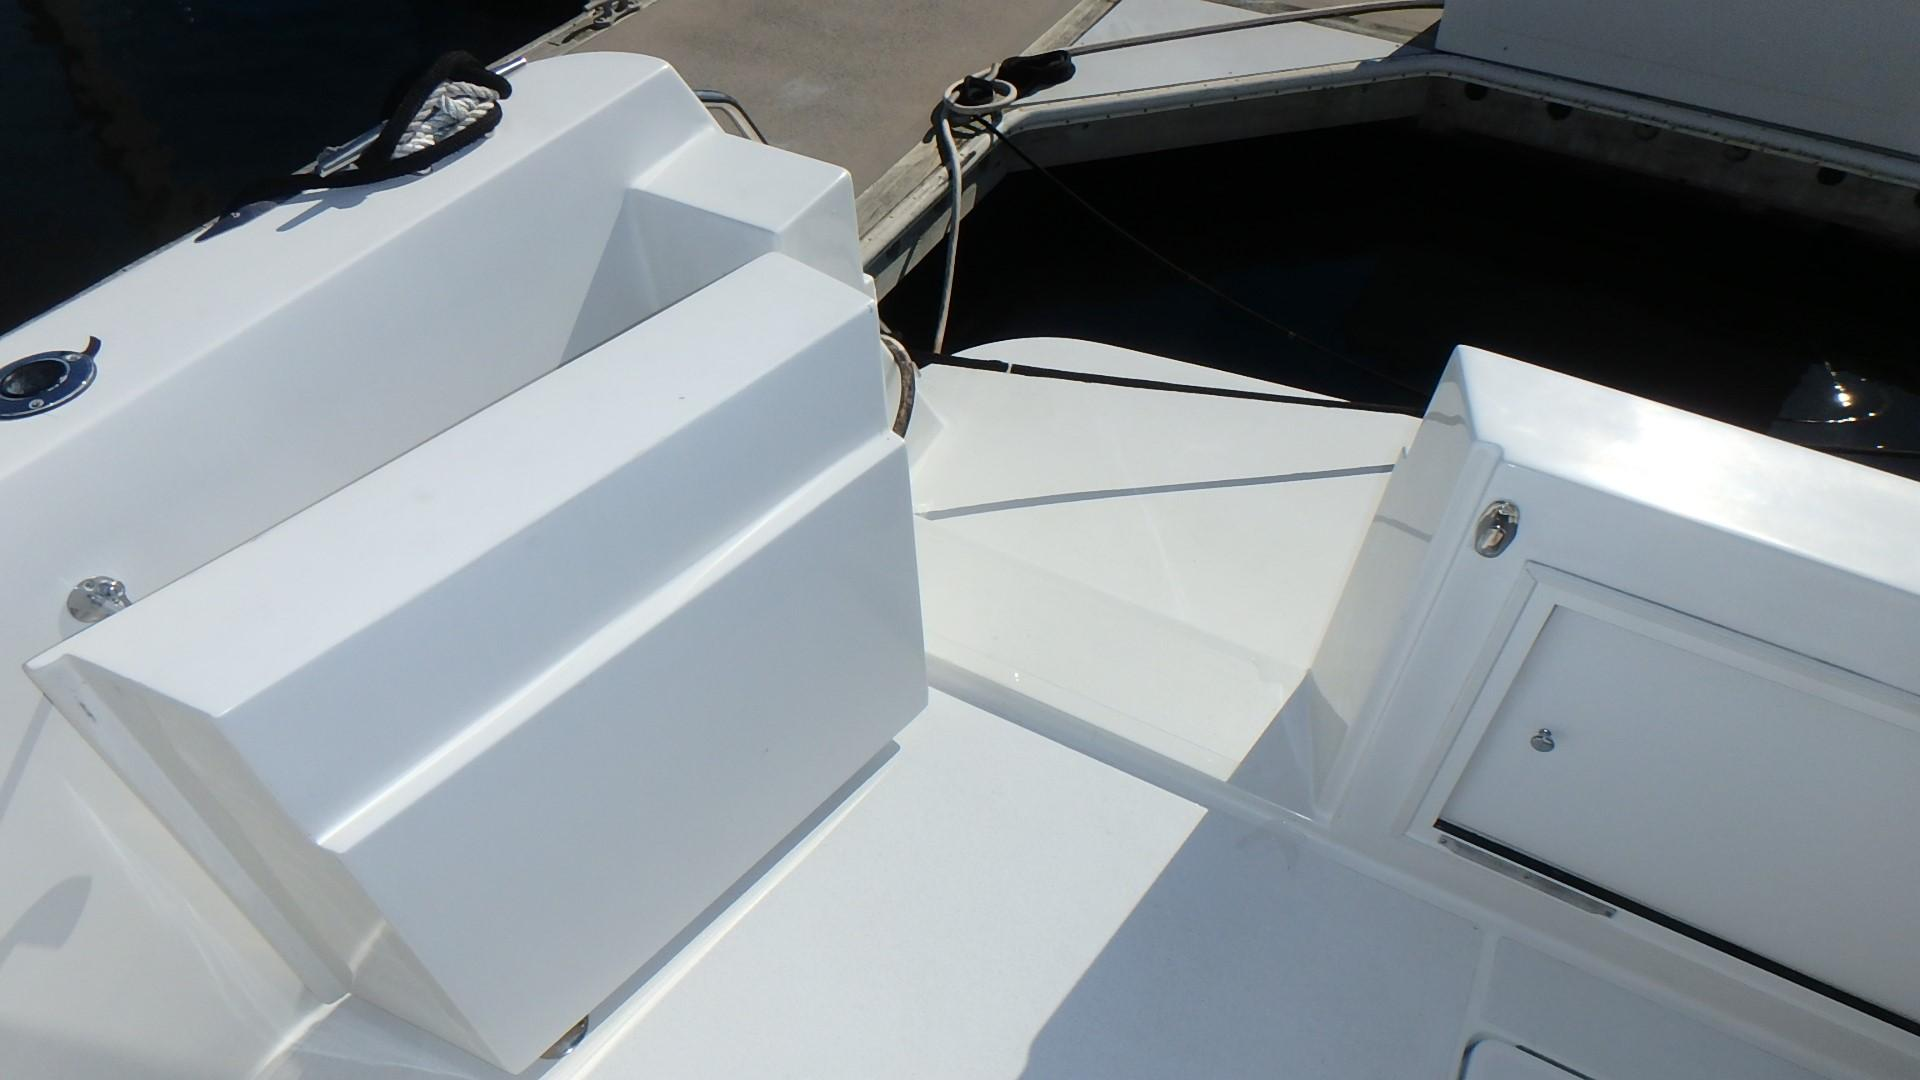 Navigator 4800 CLASSIC - Large Transom entry